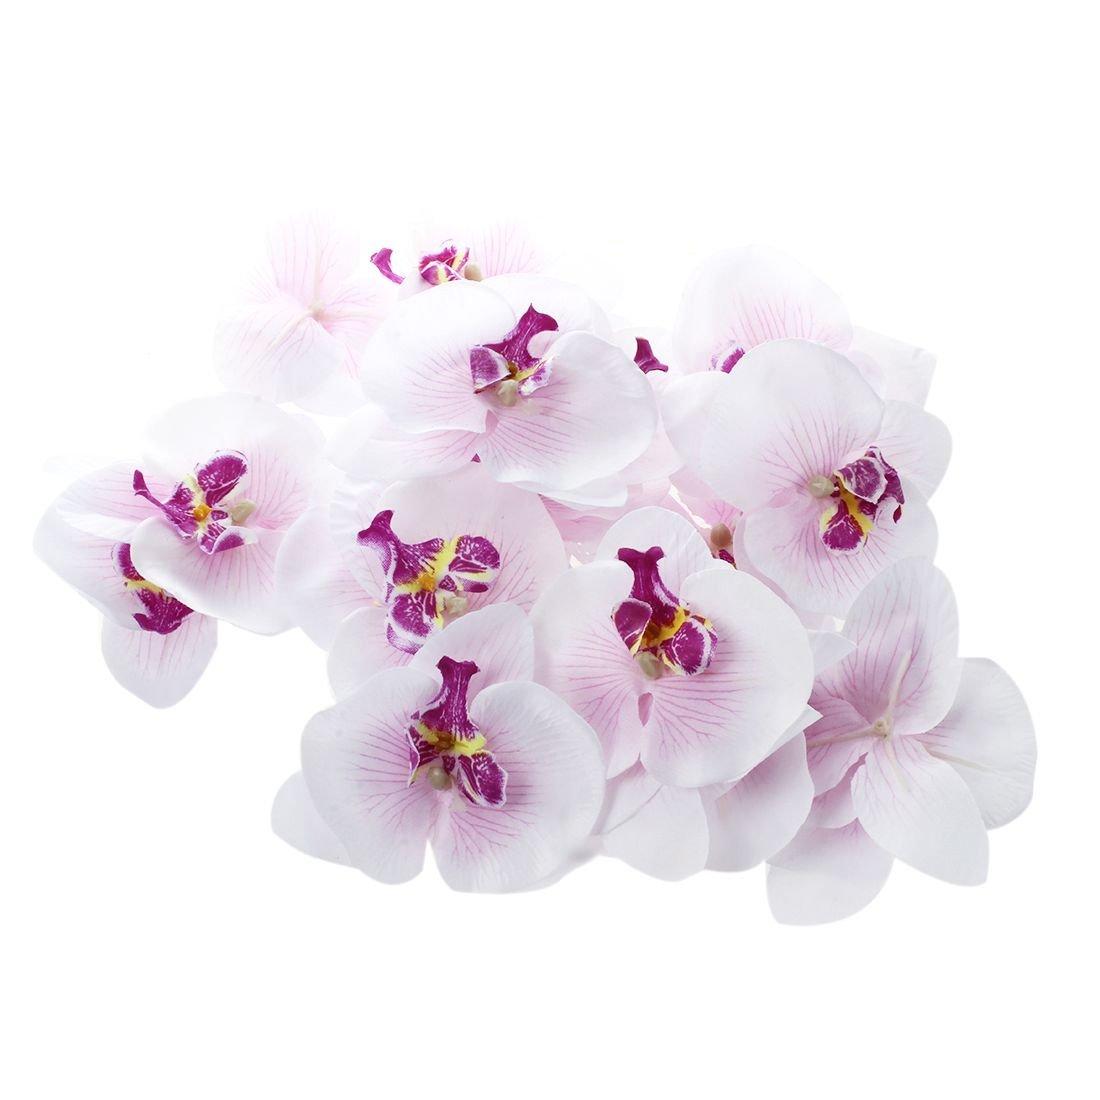 SODIAL Lote de 20 pcs de Mariposa Orquidea de 9 cm Cabeza de Flor Artificial Decoracion para Boda Accesorio para Broche para el Pelo